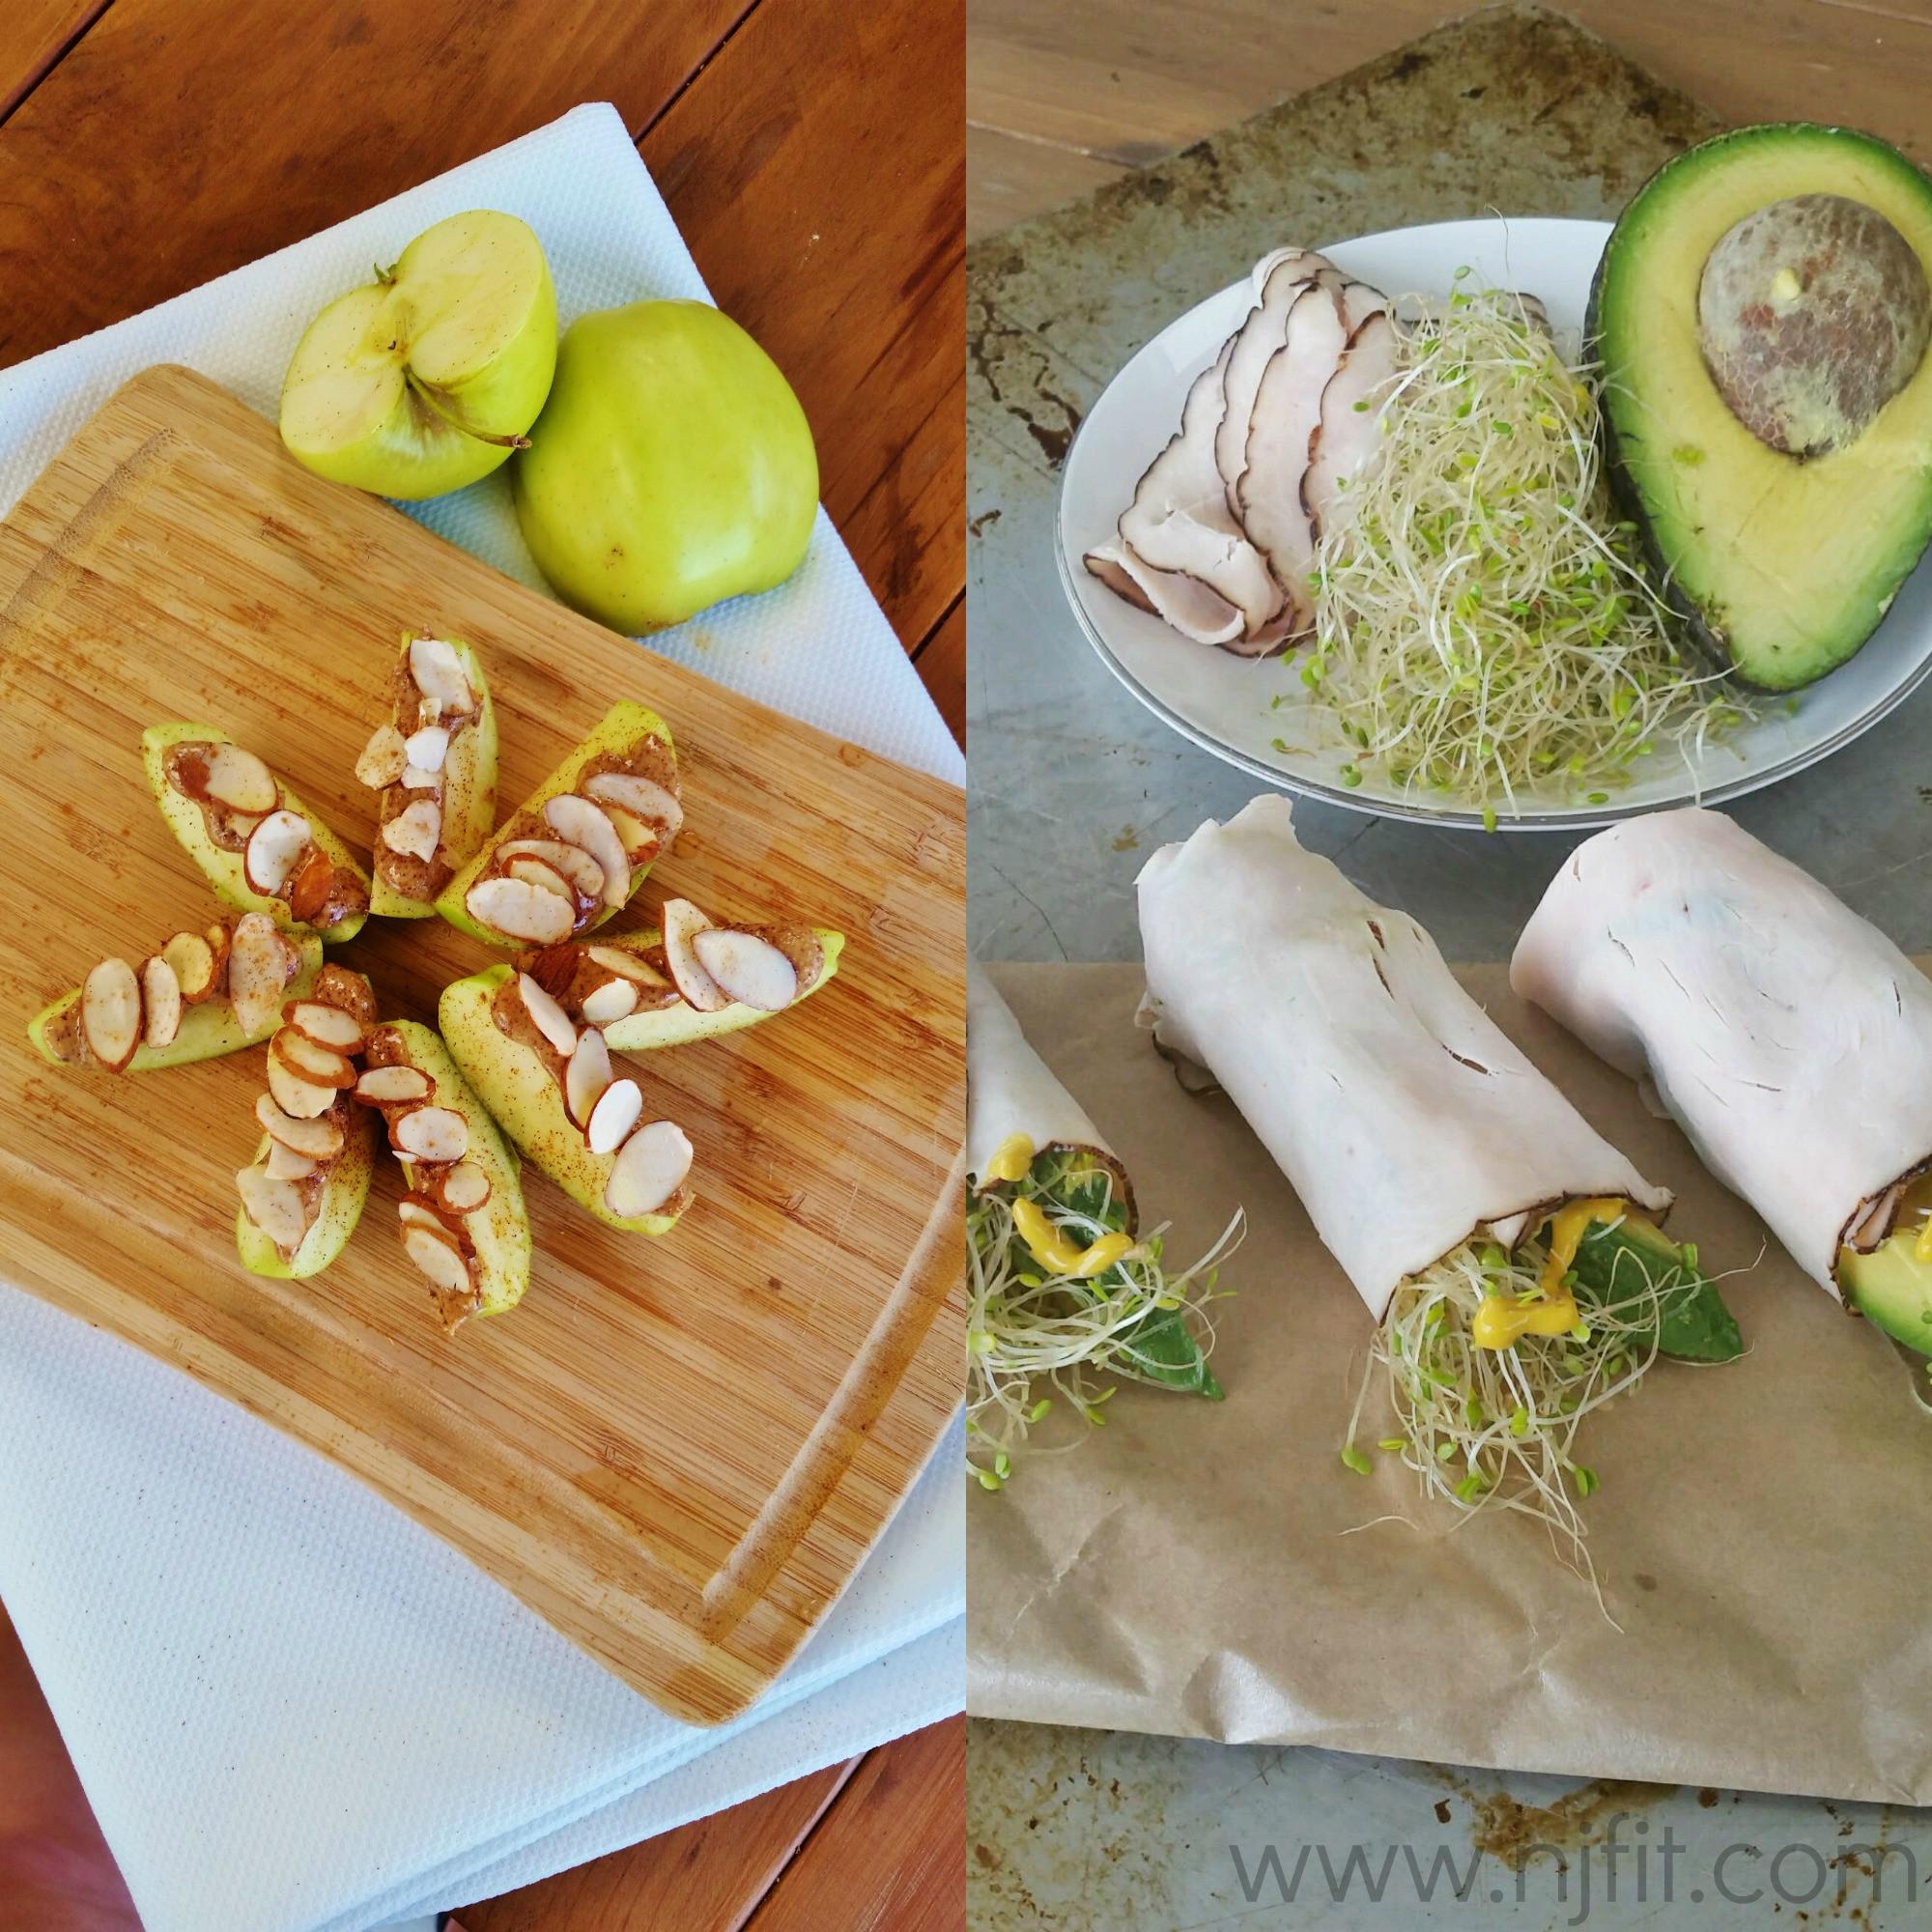 Healthy But Good Snacks  Quick healthy snacks 2 Natalie Jill Fitness